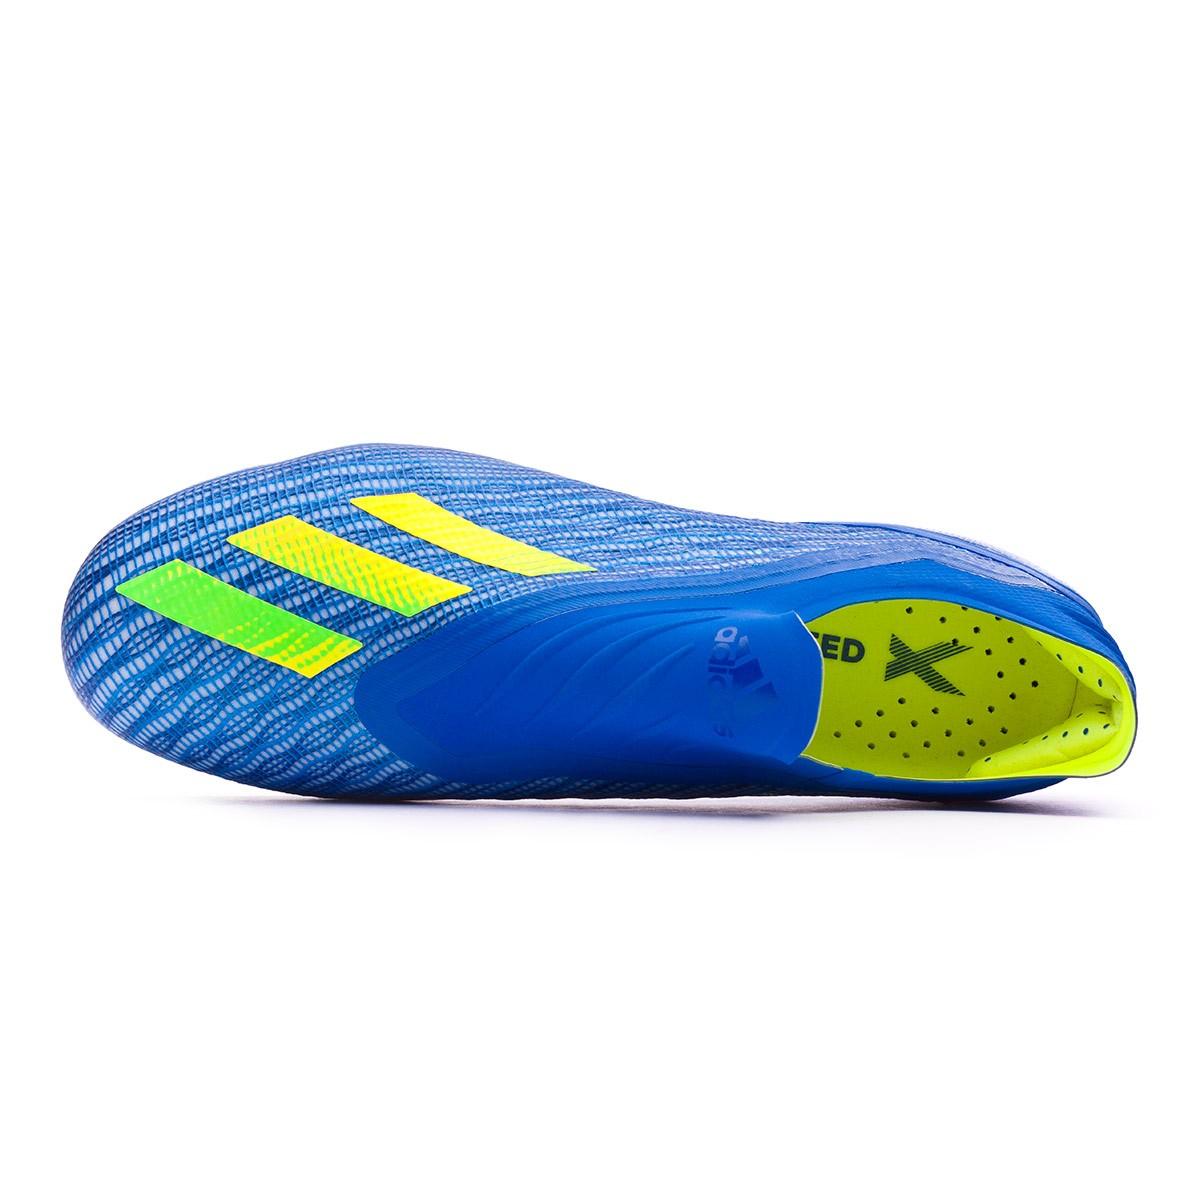 Football Boots adidas X 18+ FG Foot